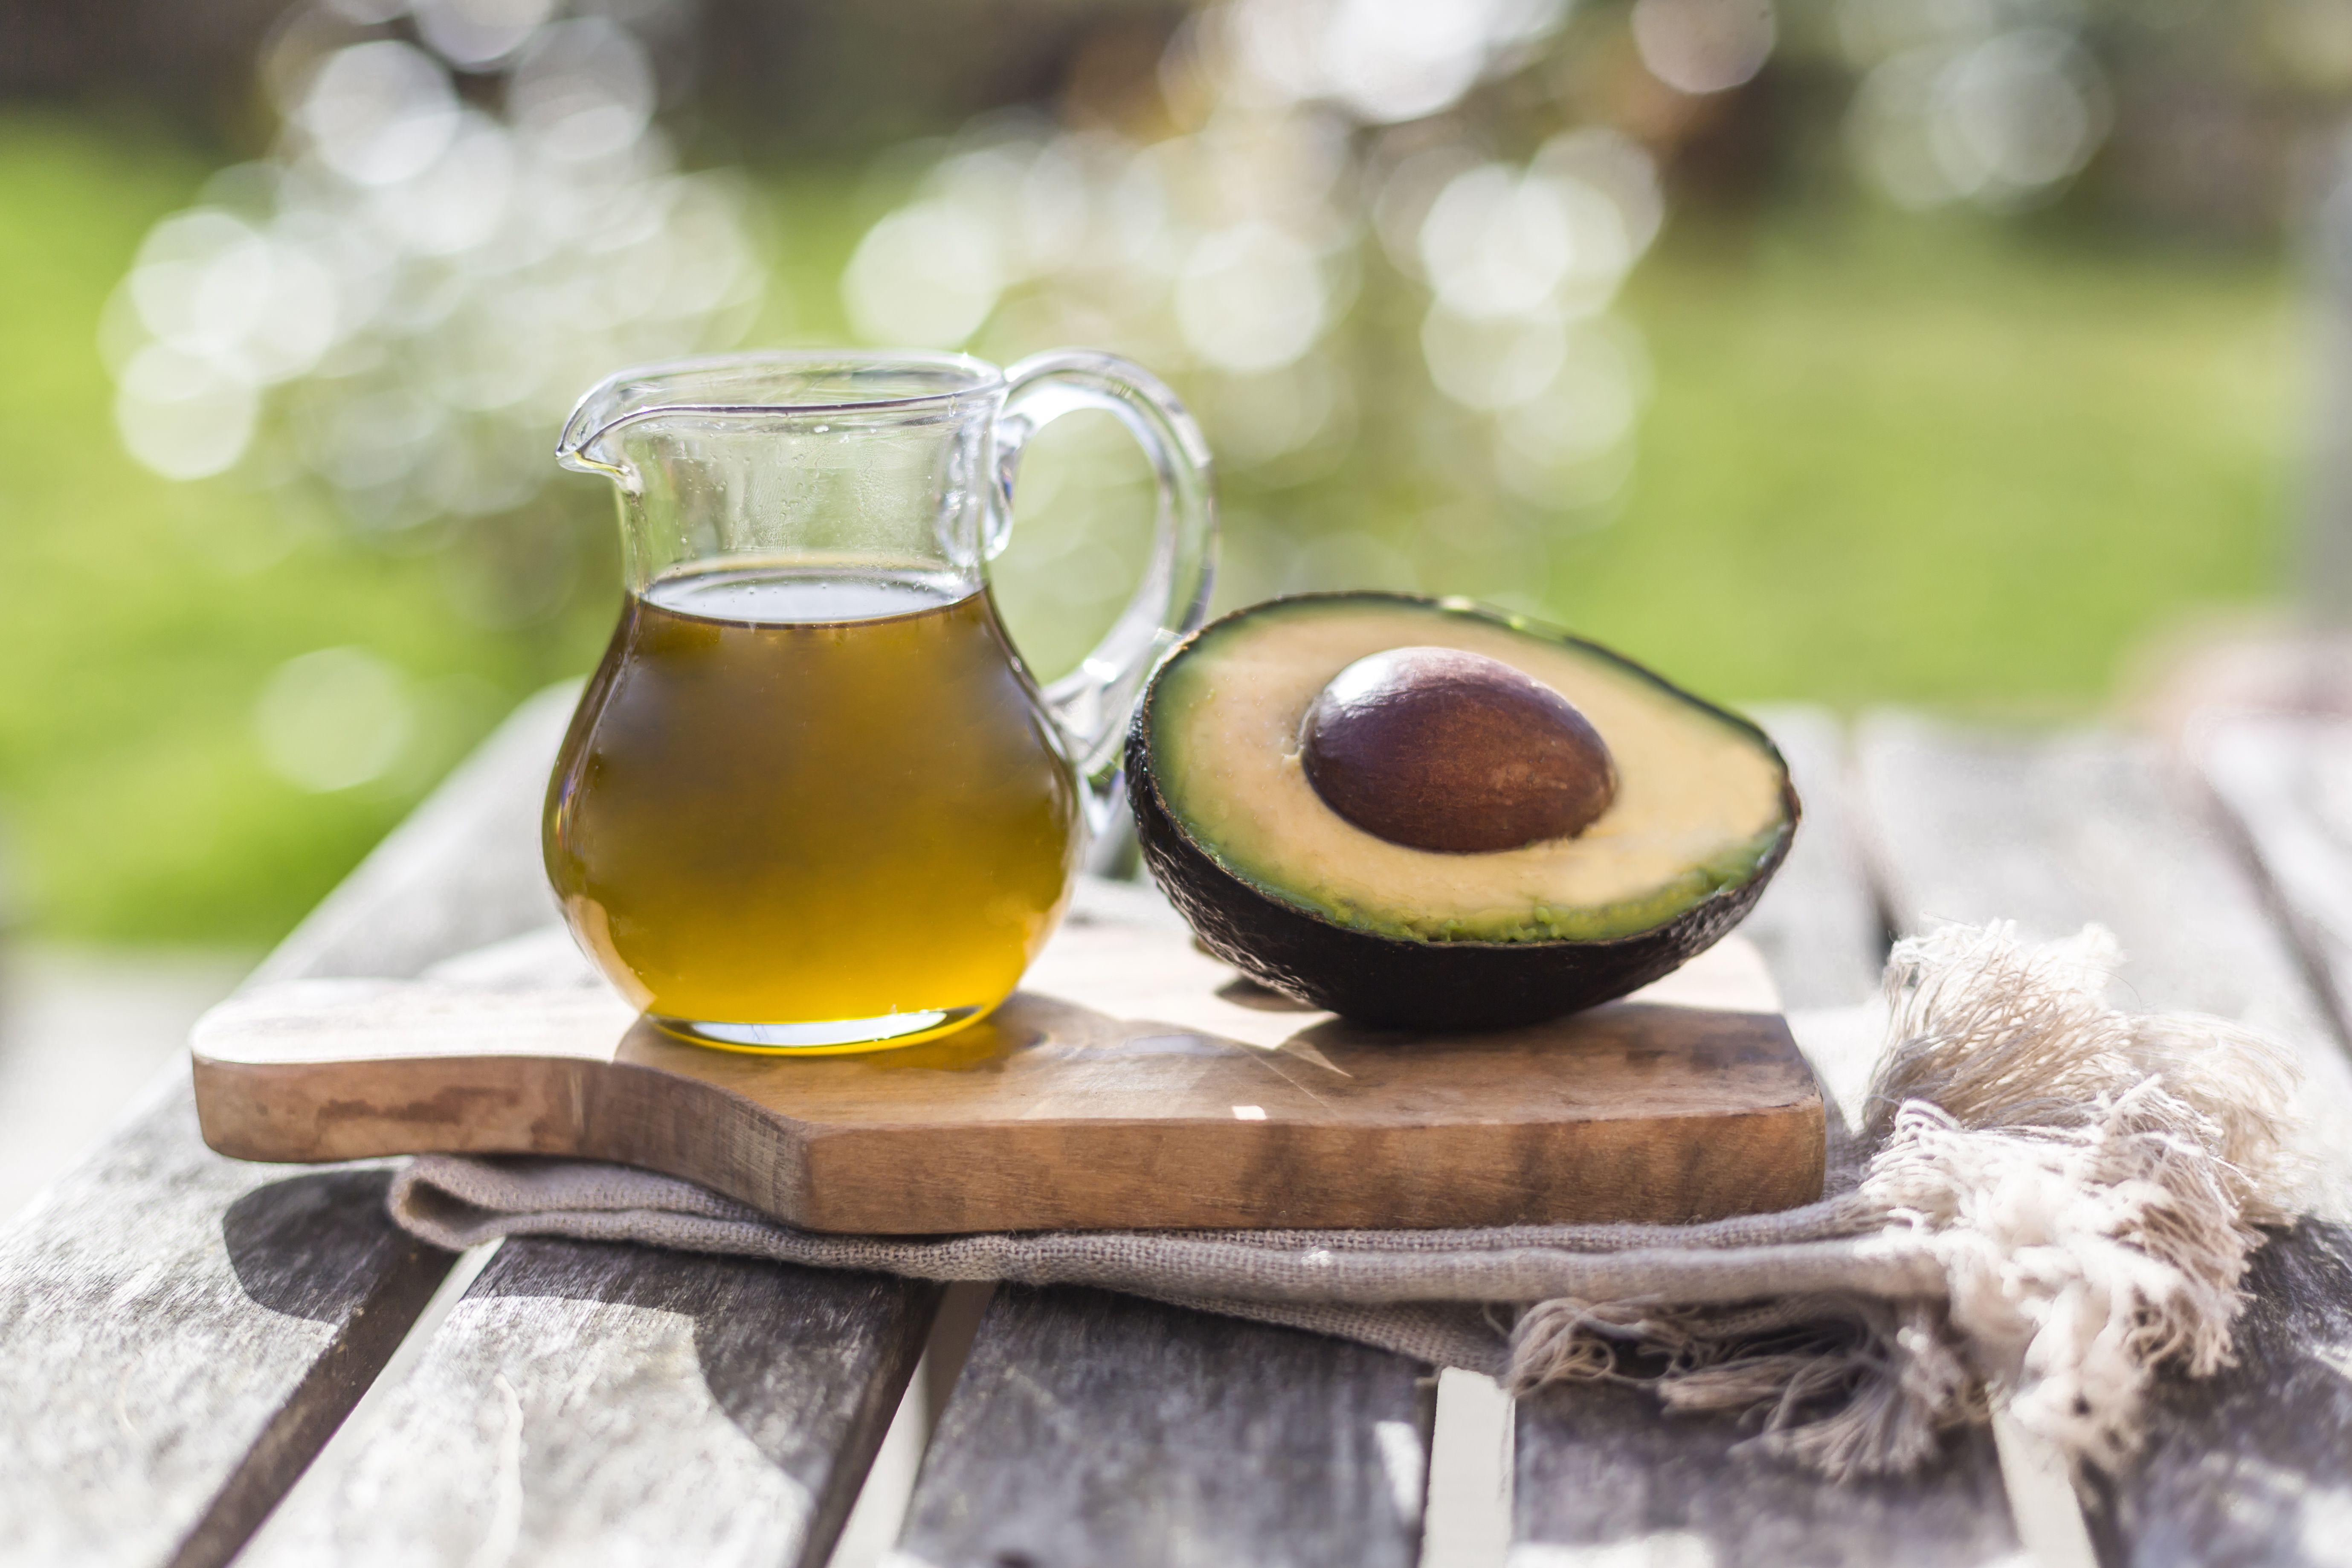 Half of avocado and glass jug of avocado oil on wooden board